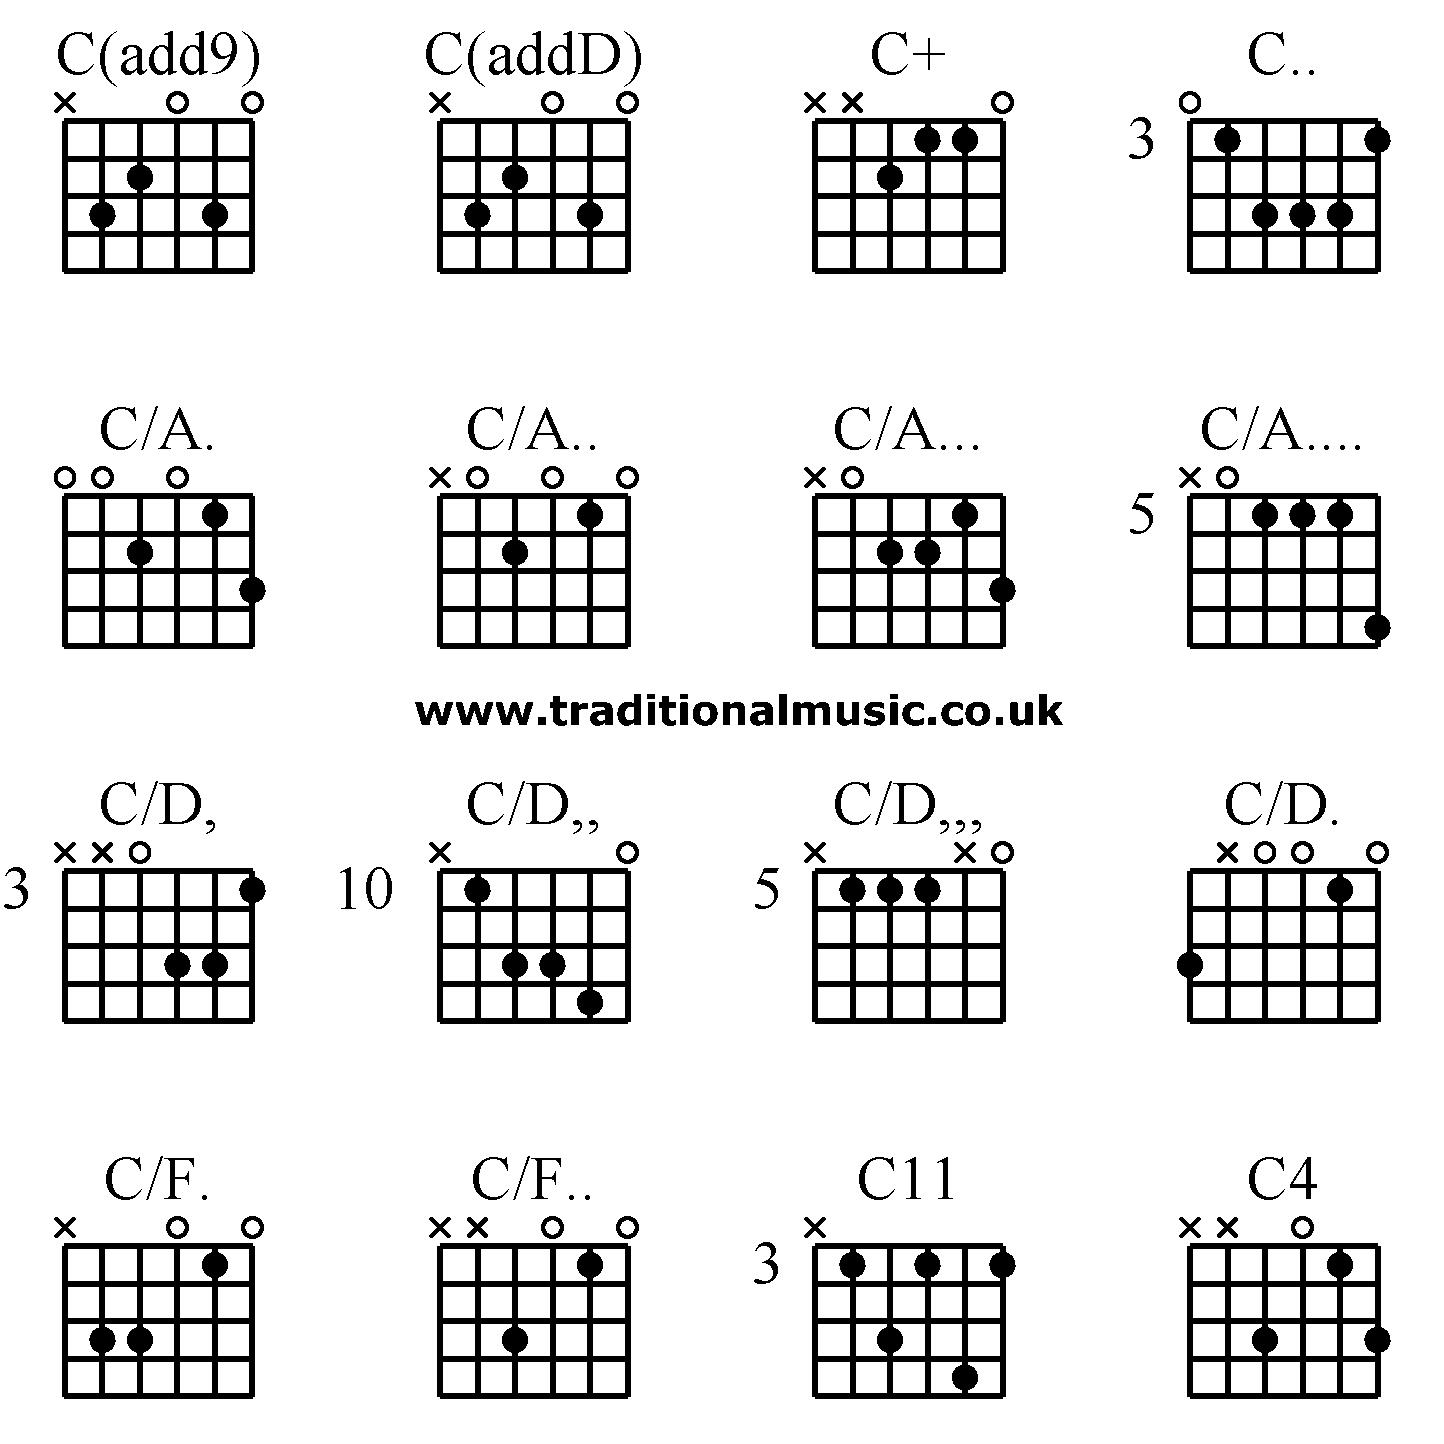 Advanced guitar chords:C(add9) C(addD) C+ C.., C/A. C/A ...